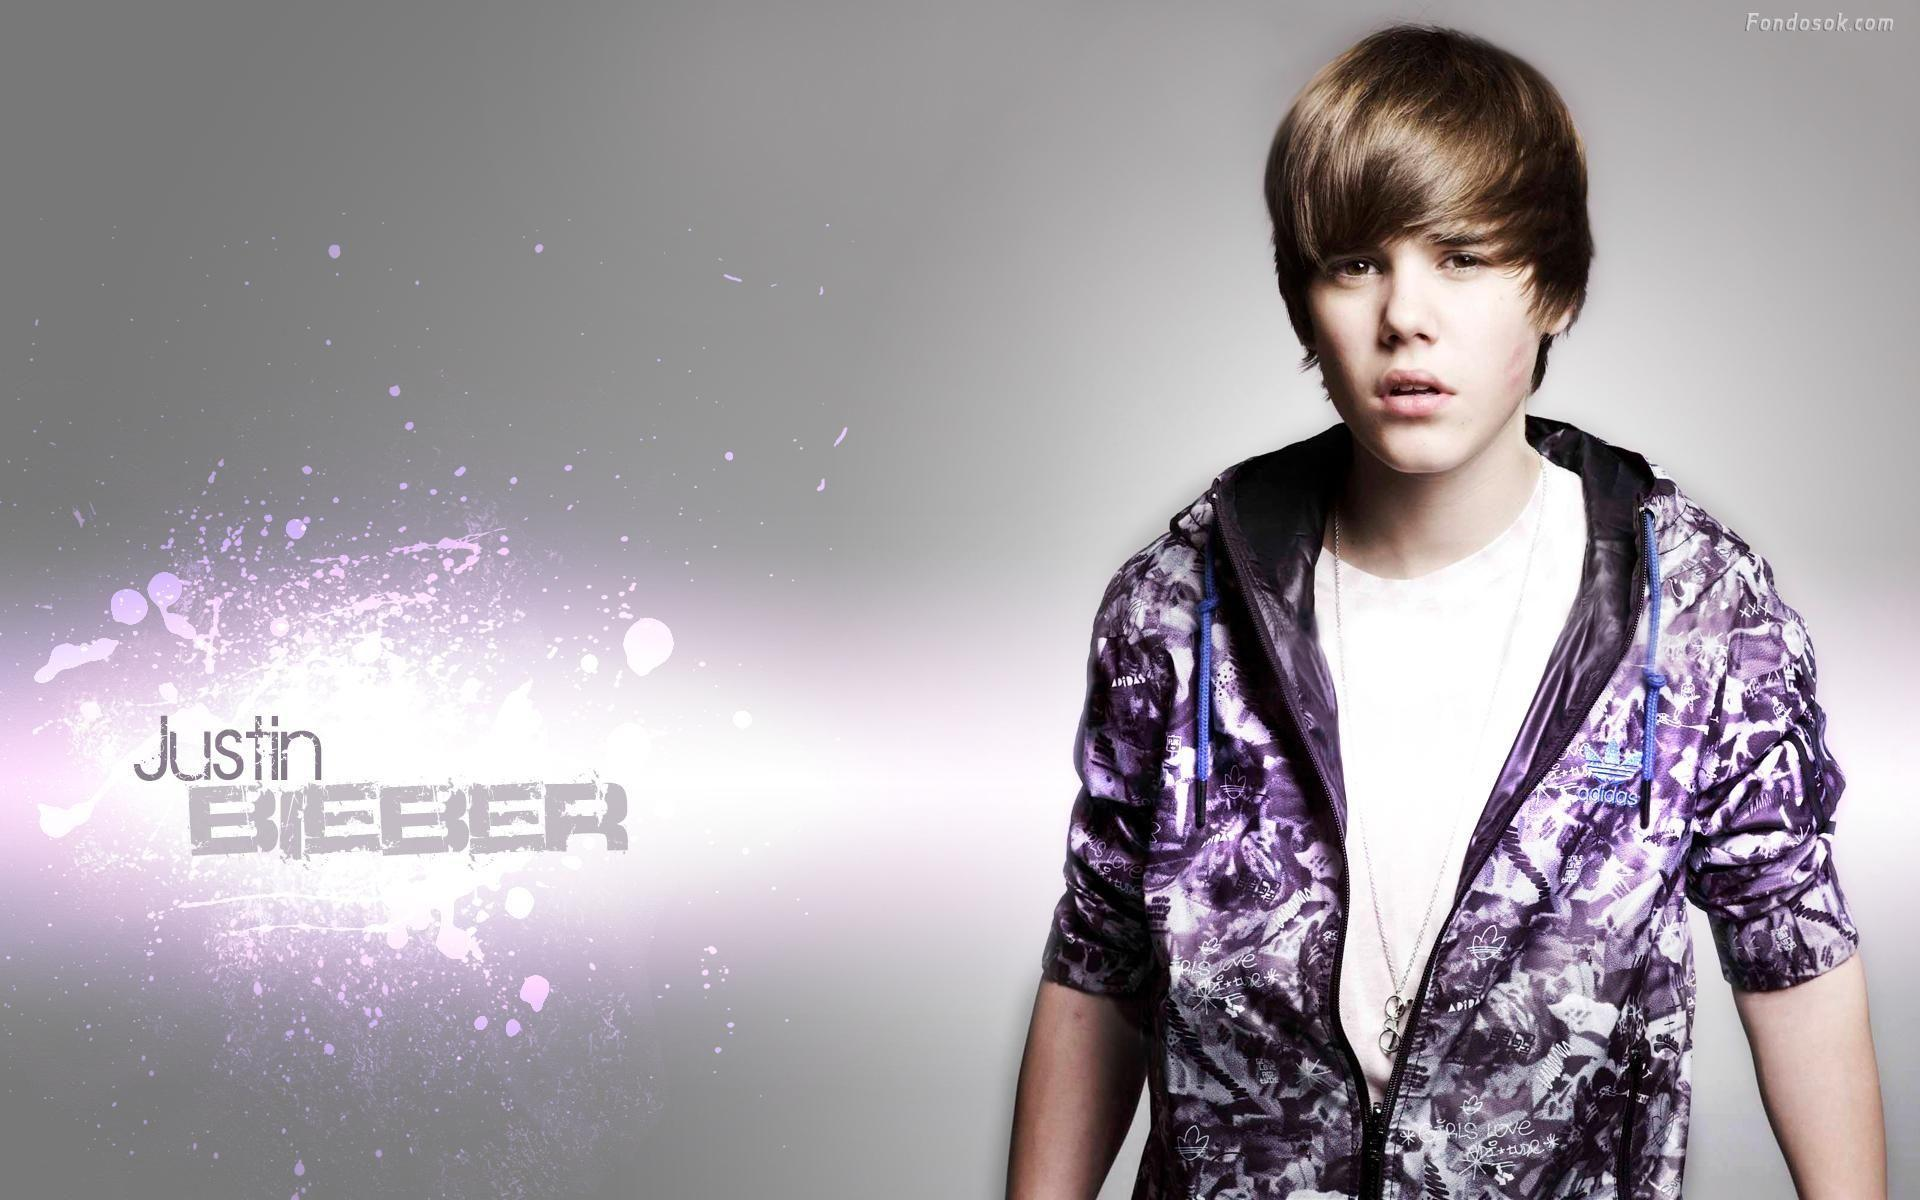 Hd wallpaper justin bieber - Justin Bieber 2015 Wallpapers Wallpaper Cave